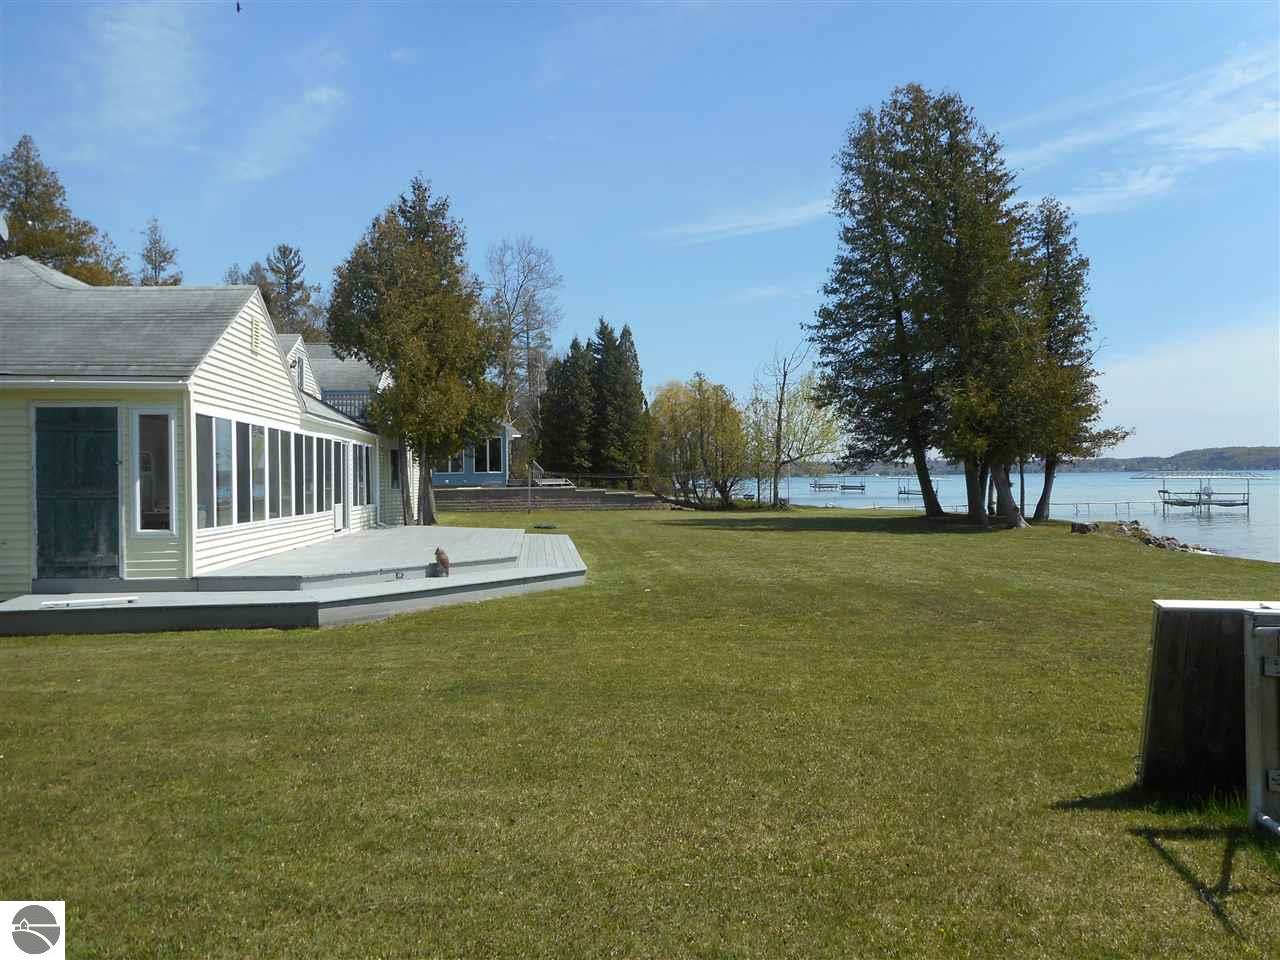 Michigan benzie county benzonia -  Beulah Michigan 49617 Real Estate And Homes Mary Dewitt